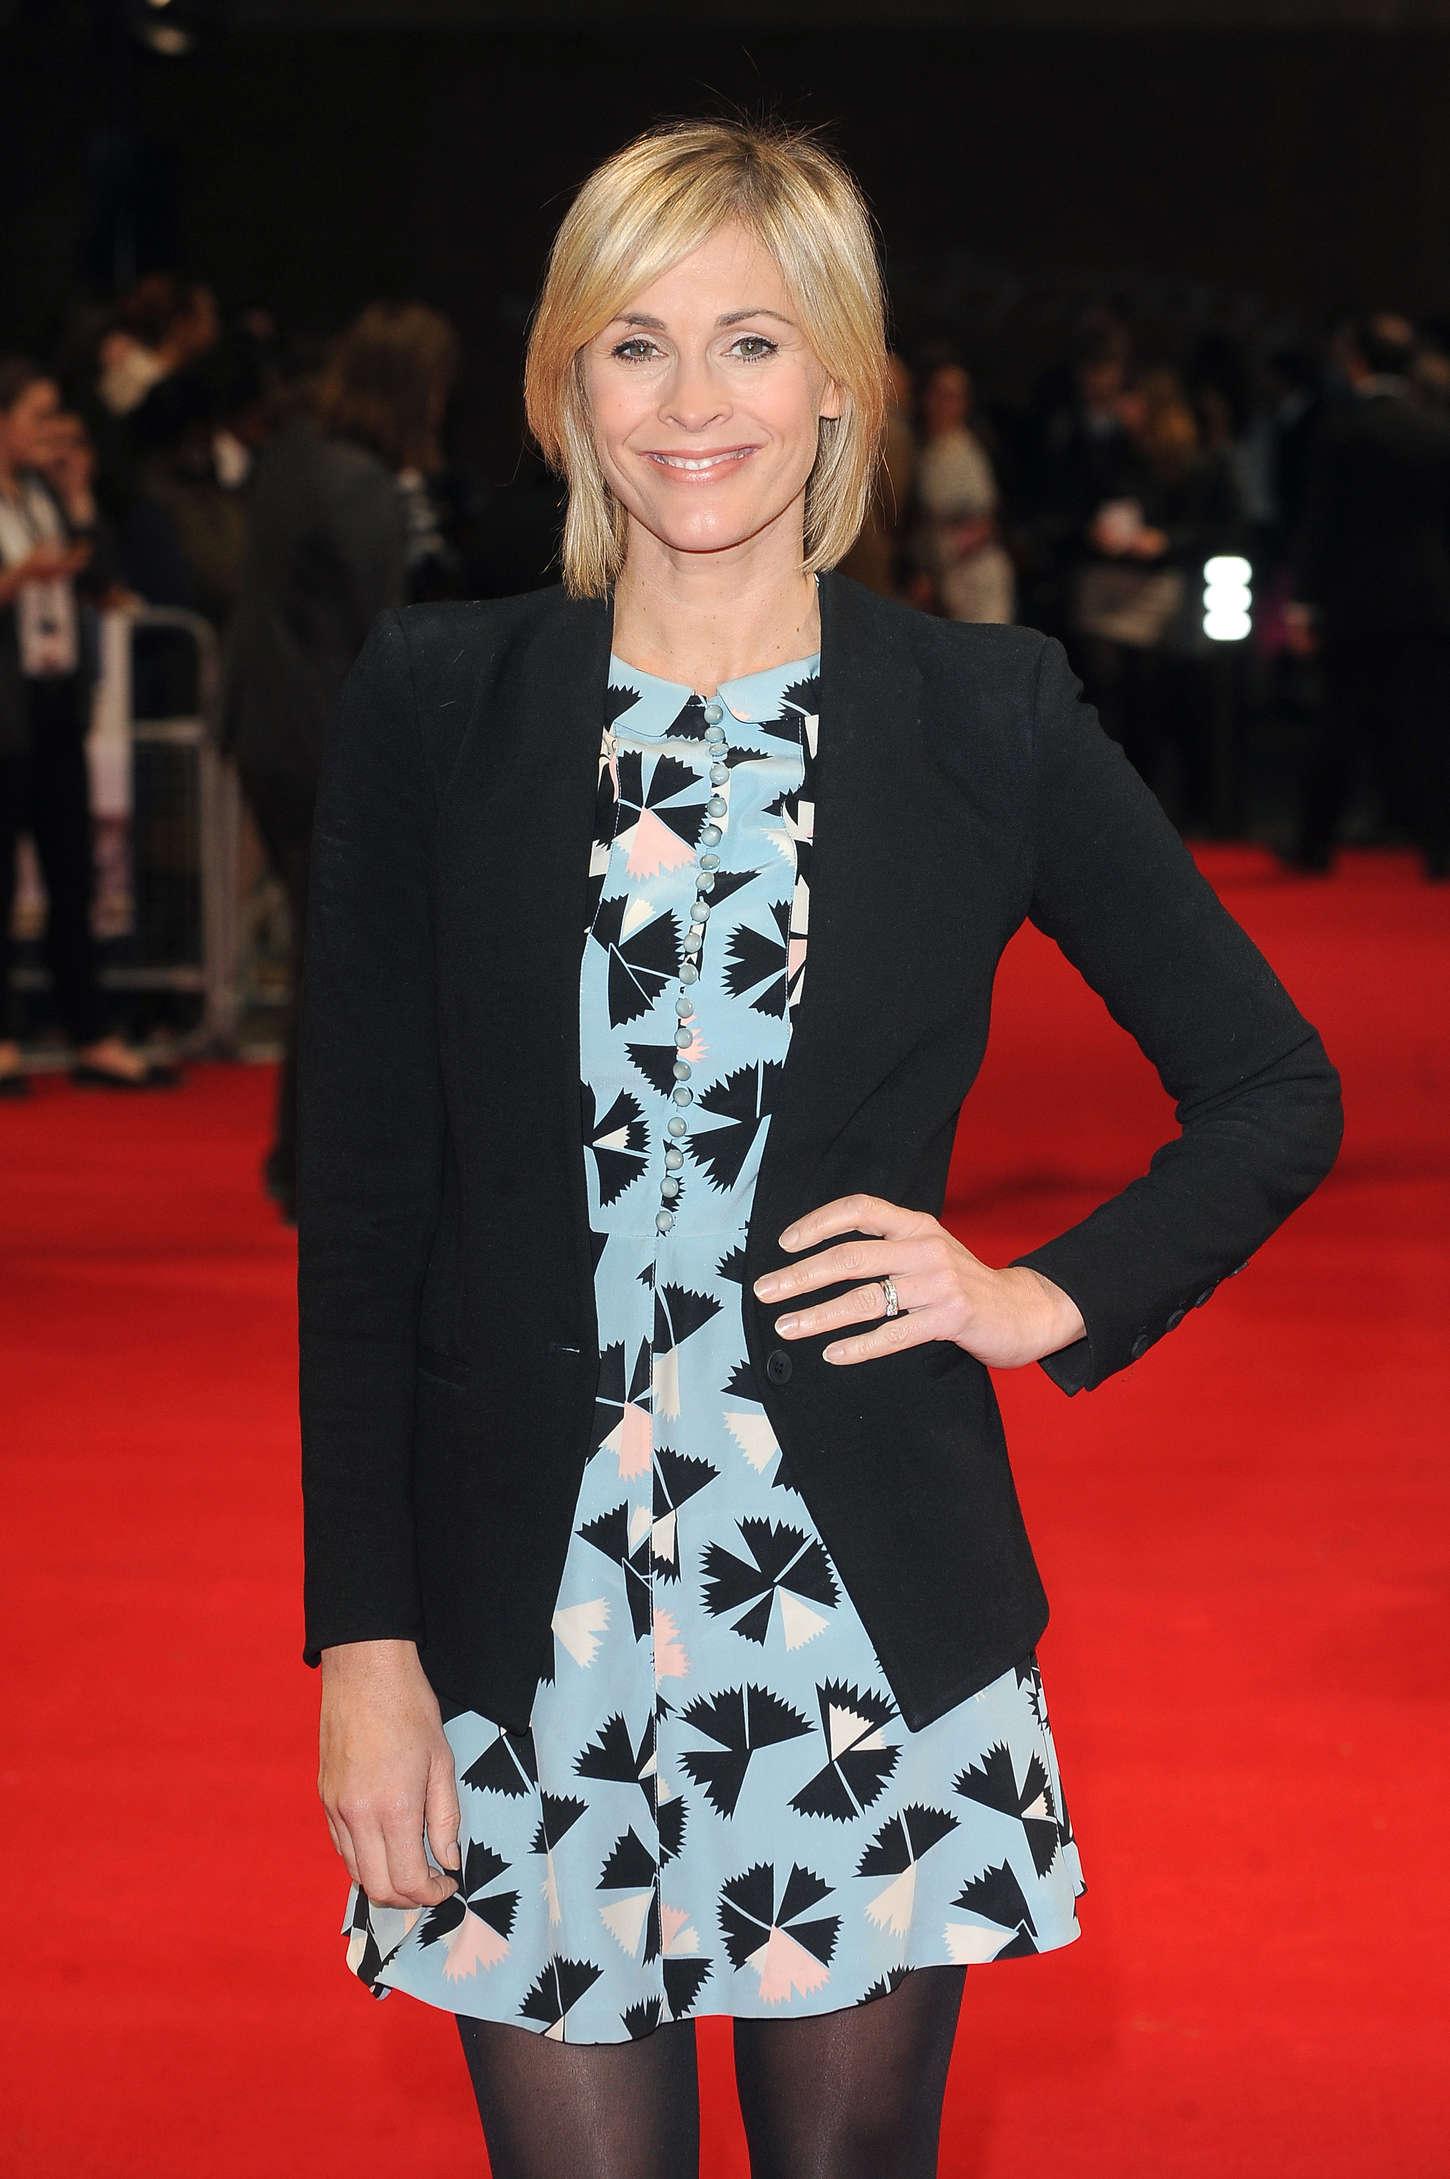 Jenni Falconer - 2014 Pride of Britain Awards in London